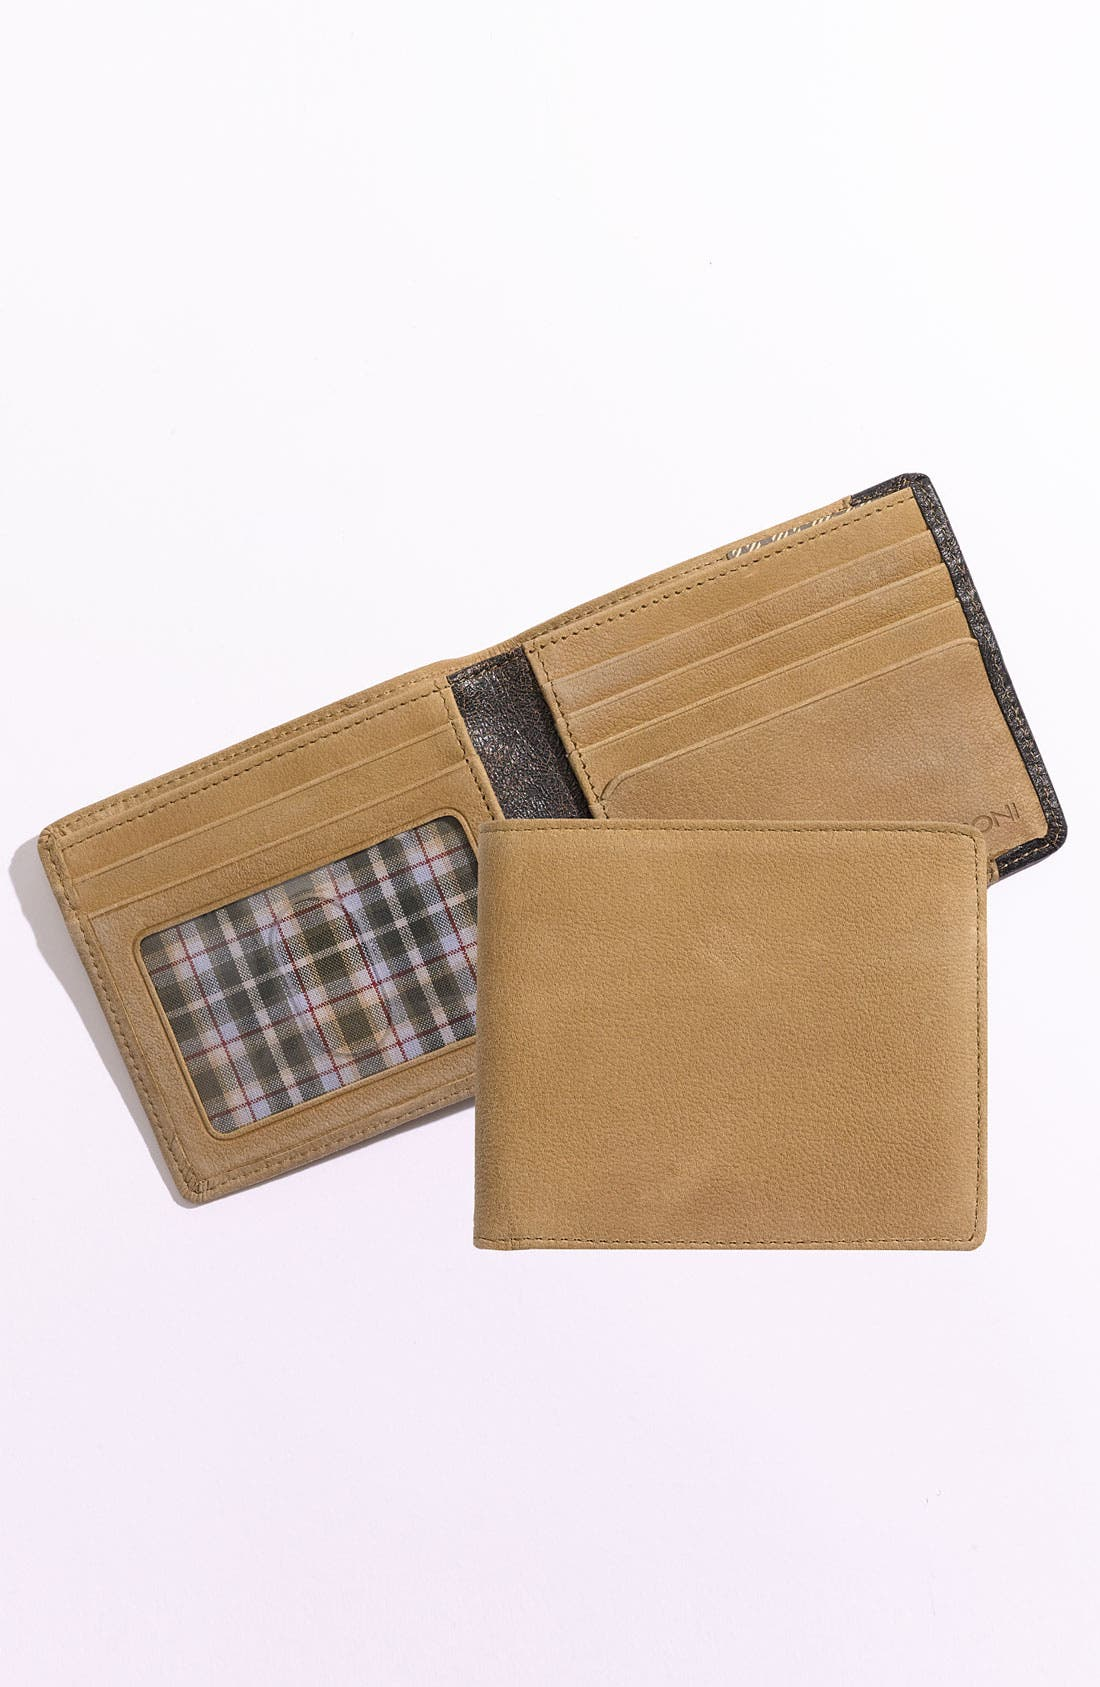 Main Image - Boconi 'Leon' Slimfold Wallet